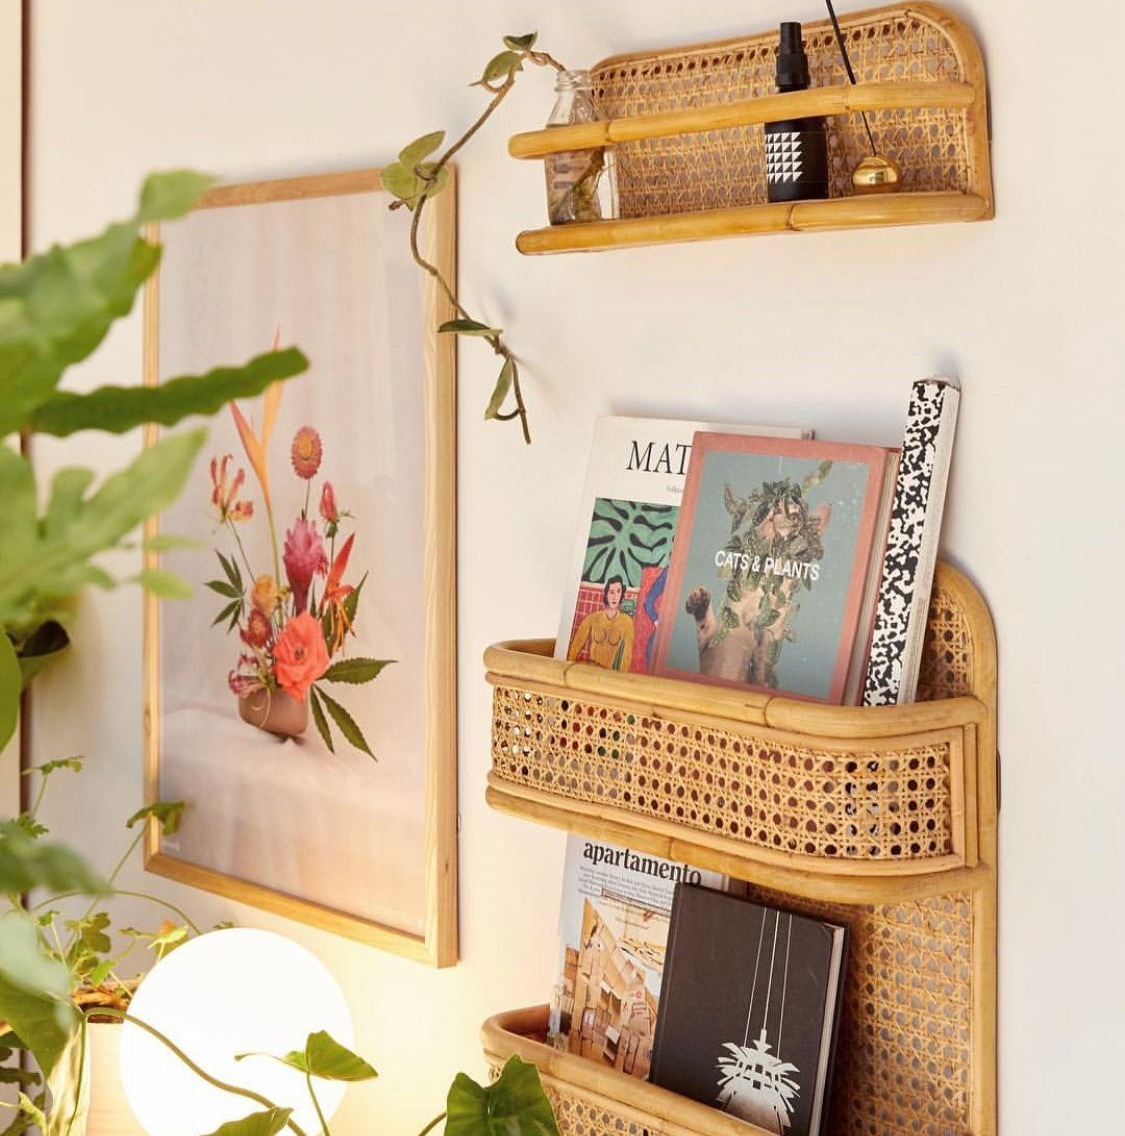 Estante del almacenaje para pared de bambú tejido a mano, Perchero de pared, organizador L46 X w13 cm